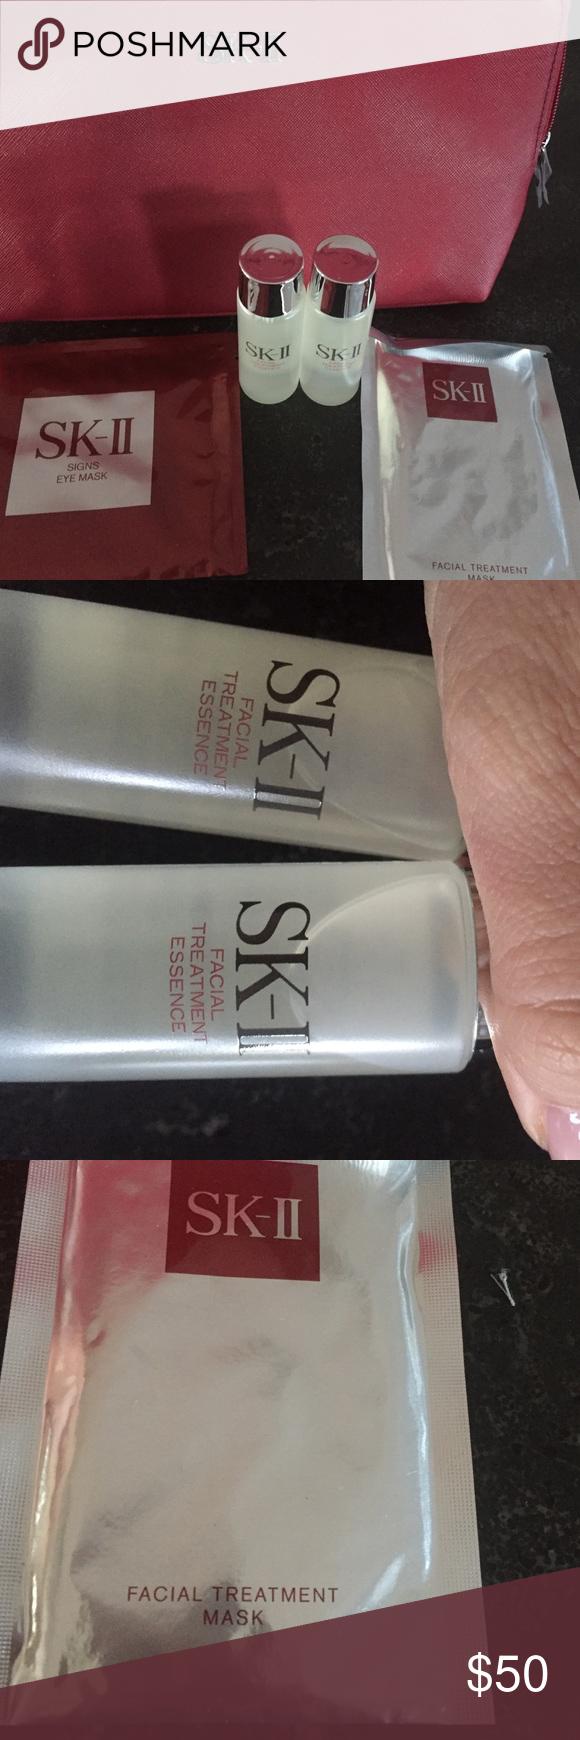 Sk-II 5 piece beauty bundle Nwt!! Brand new, never been opened!! skII Makeup